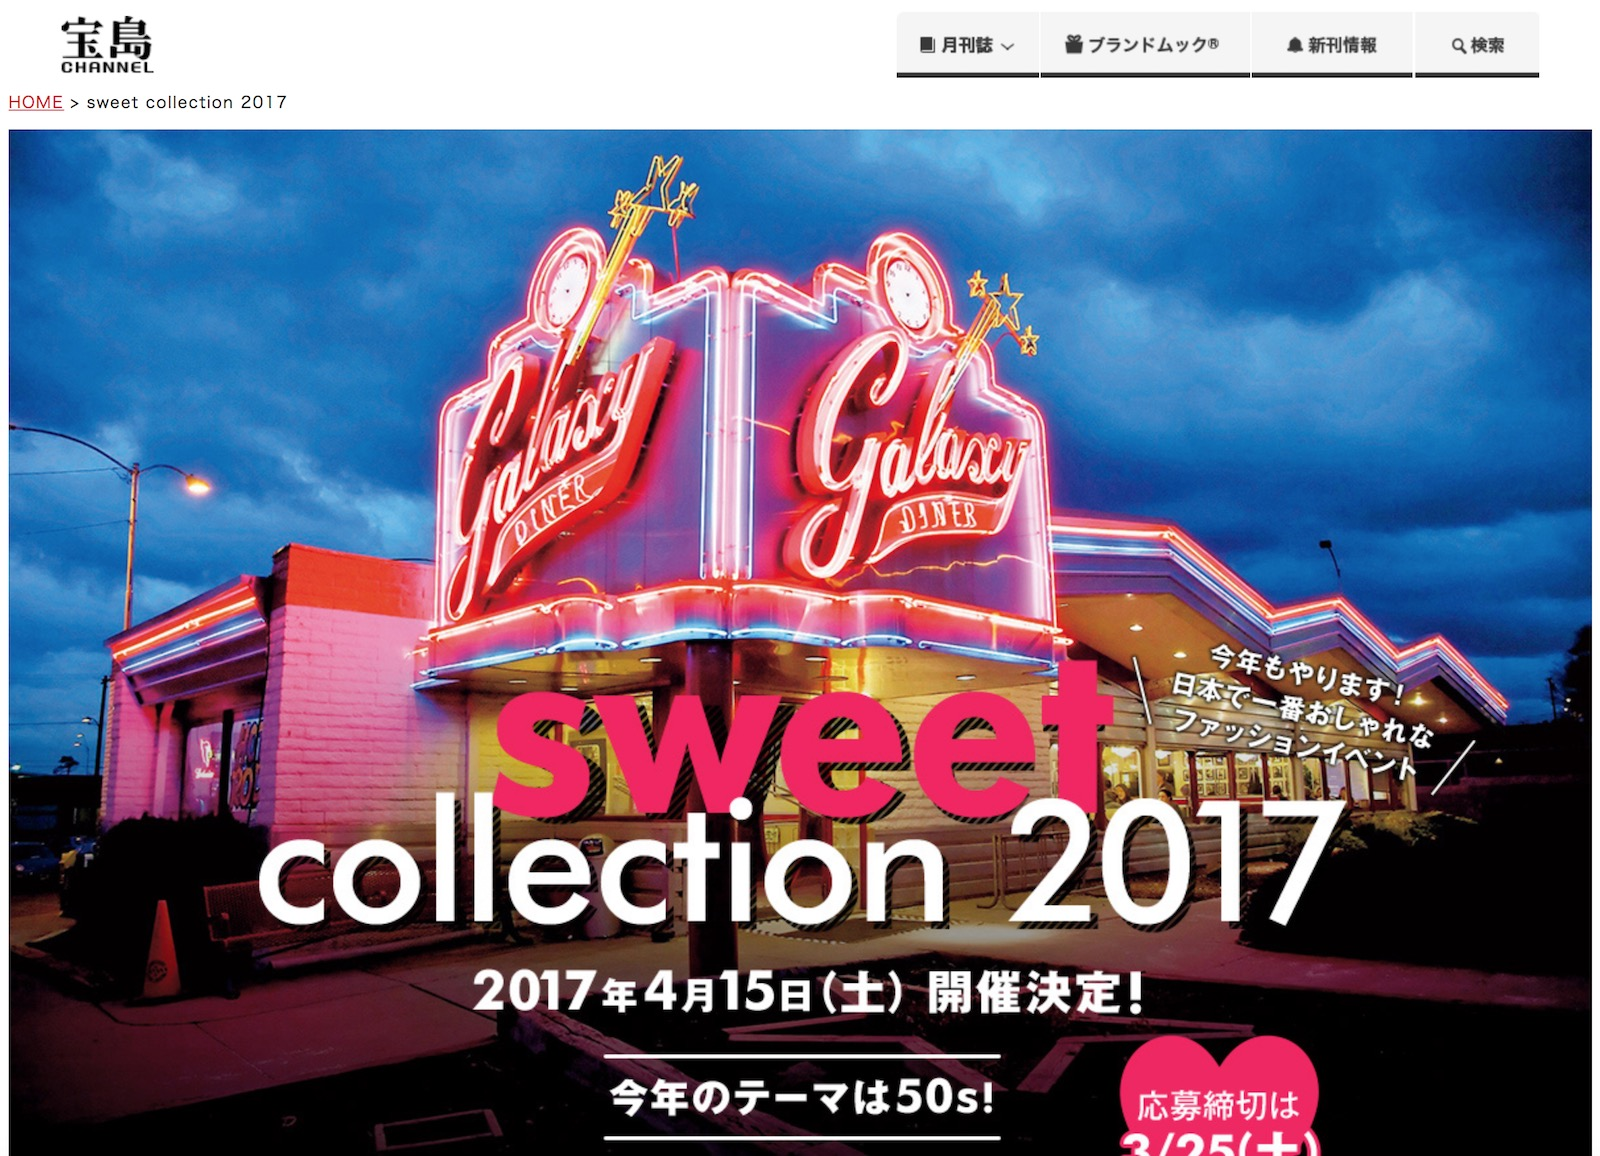 「sweet collection 2017」(東京・渋谷ヒカリエ ヒカリエホール)